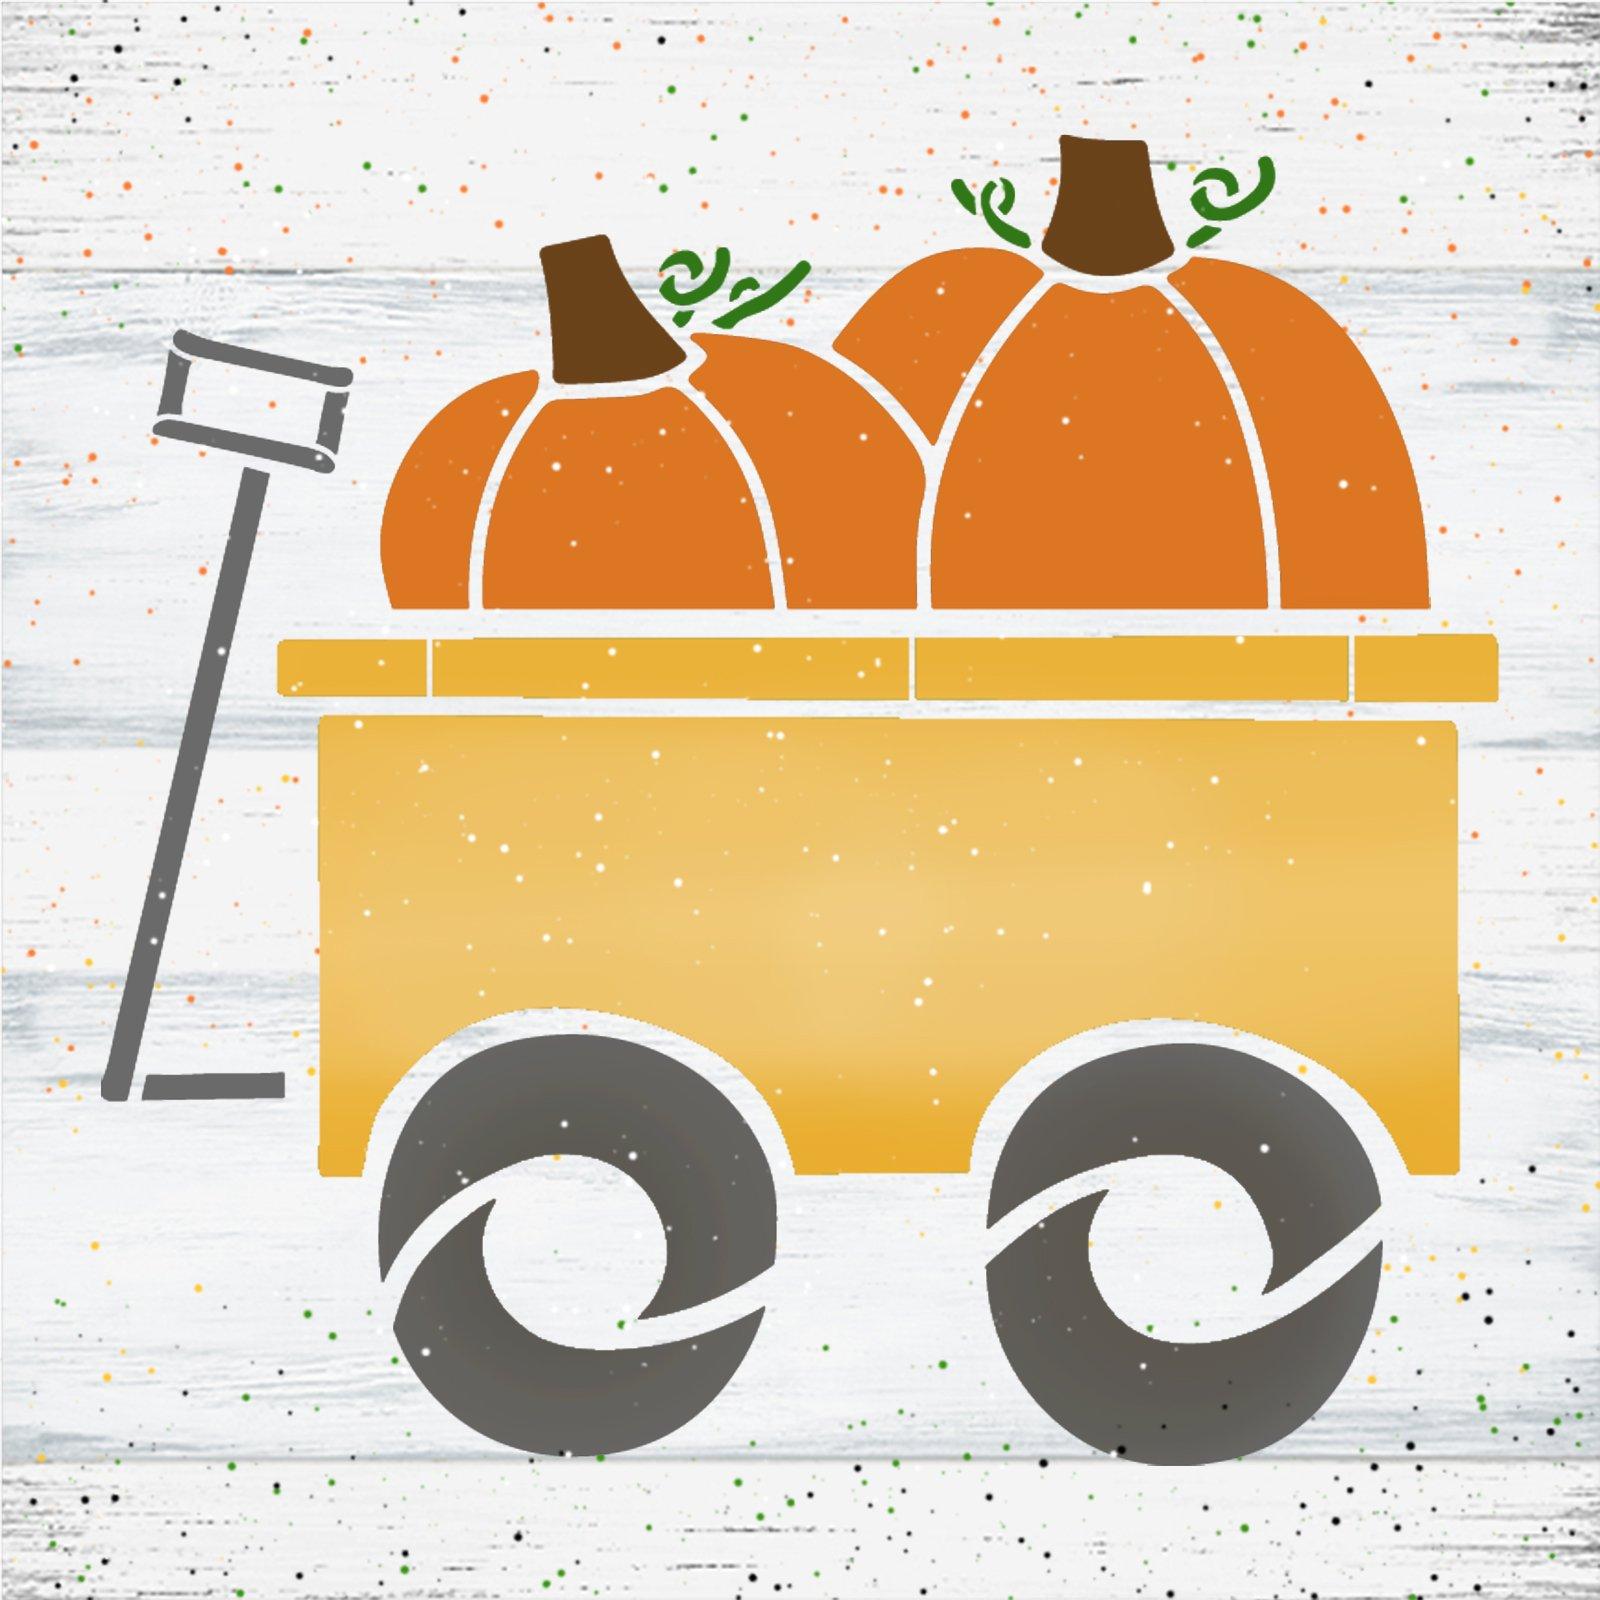 Pumpkin Wagon Stencil by StudioR12   DIY Autumn Garden Cart Home Decor   Craft & Paint Fall Farmhouse Wood Sign Reusable Mylar Template   Select Size